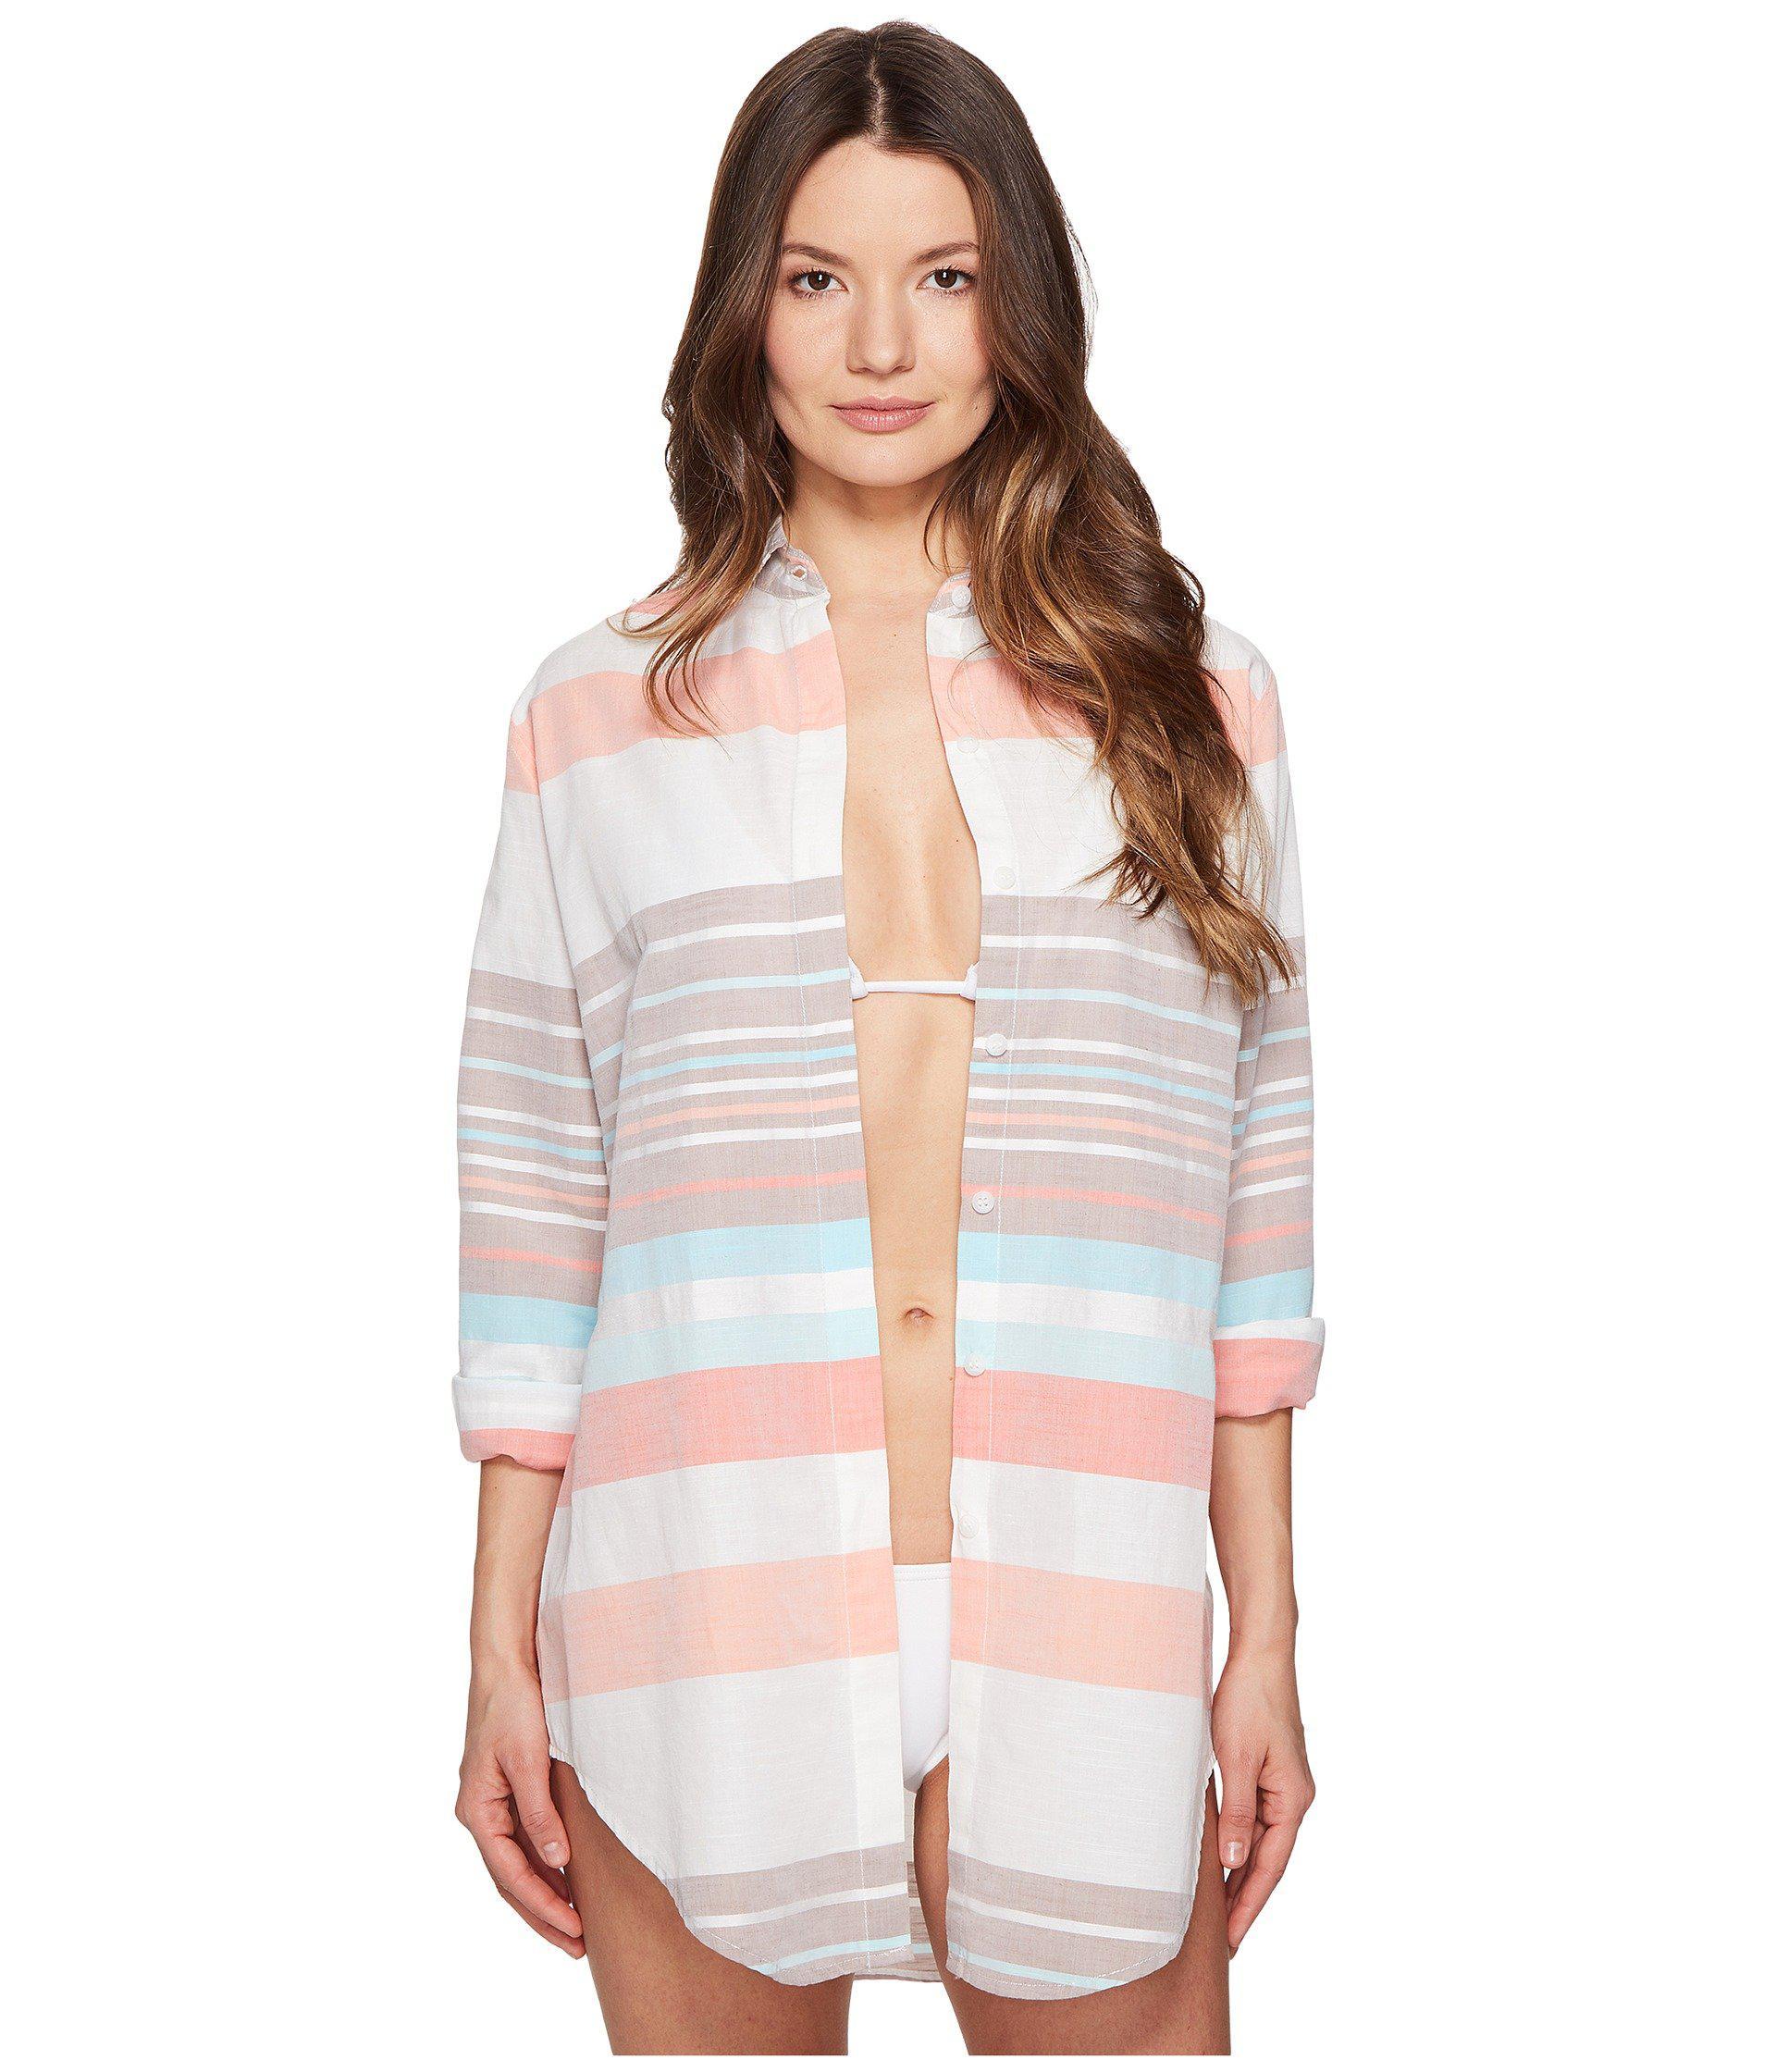 a3abb5649930d Letarte. Women s Stripe Beachshirt